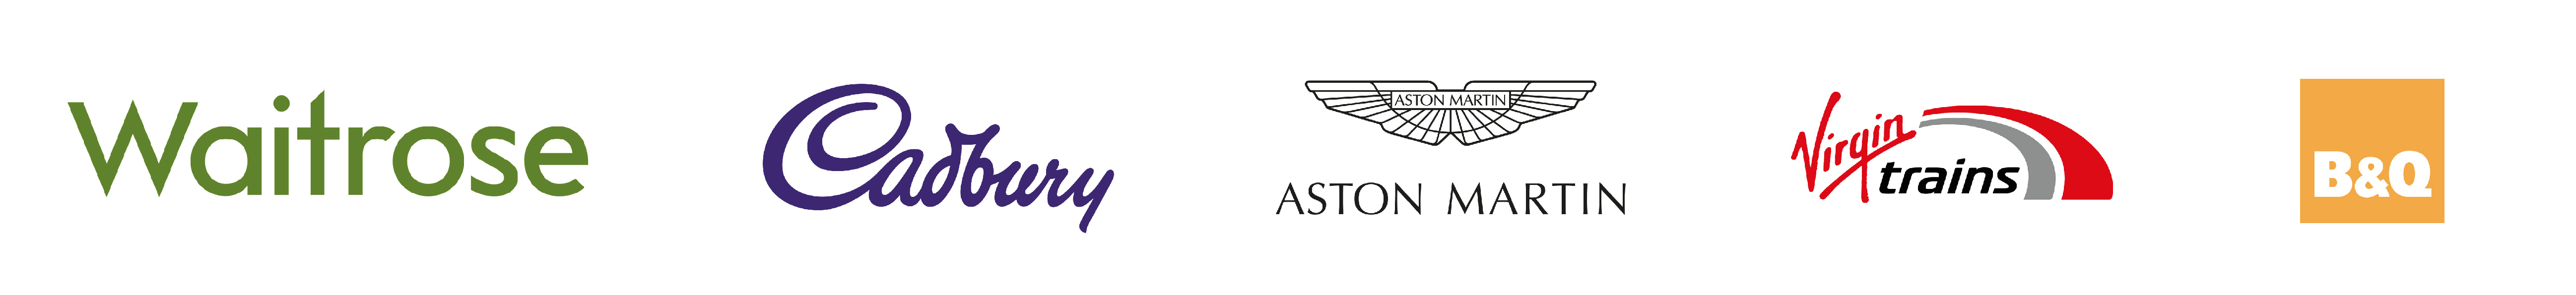 logos-06-06.jpg